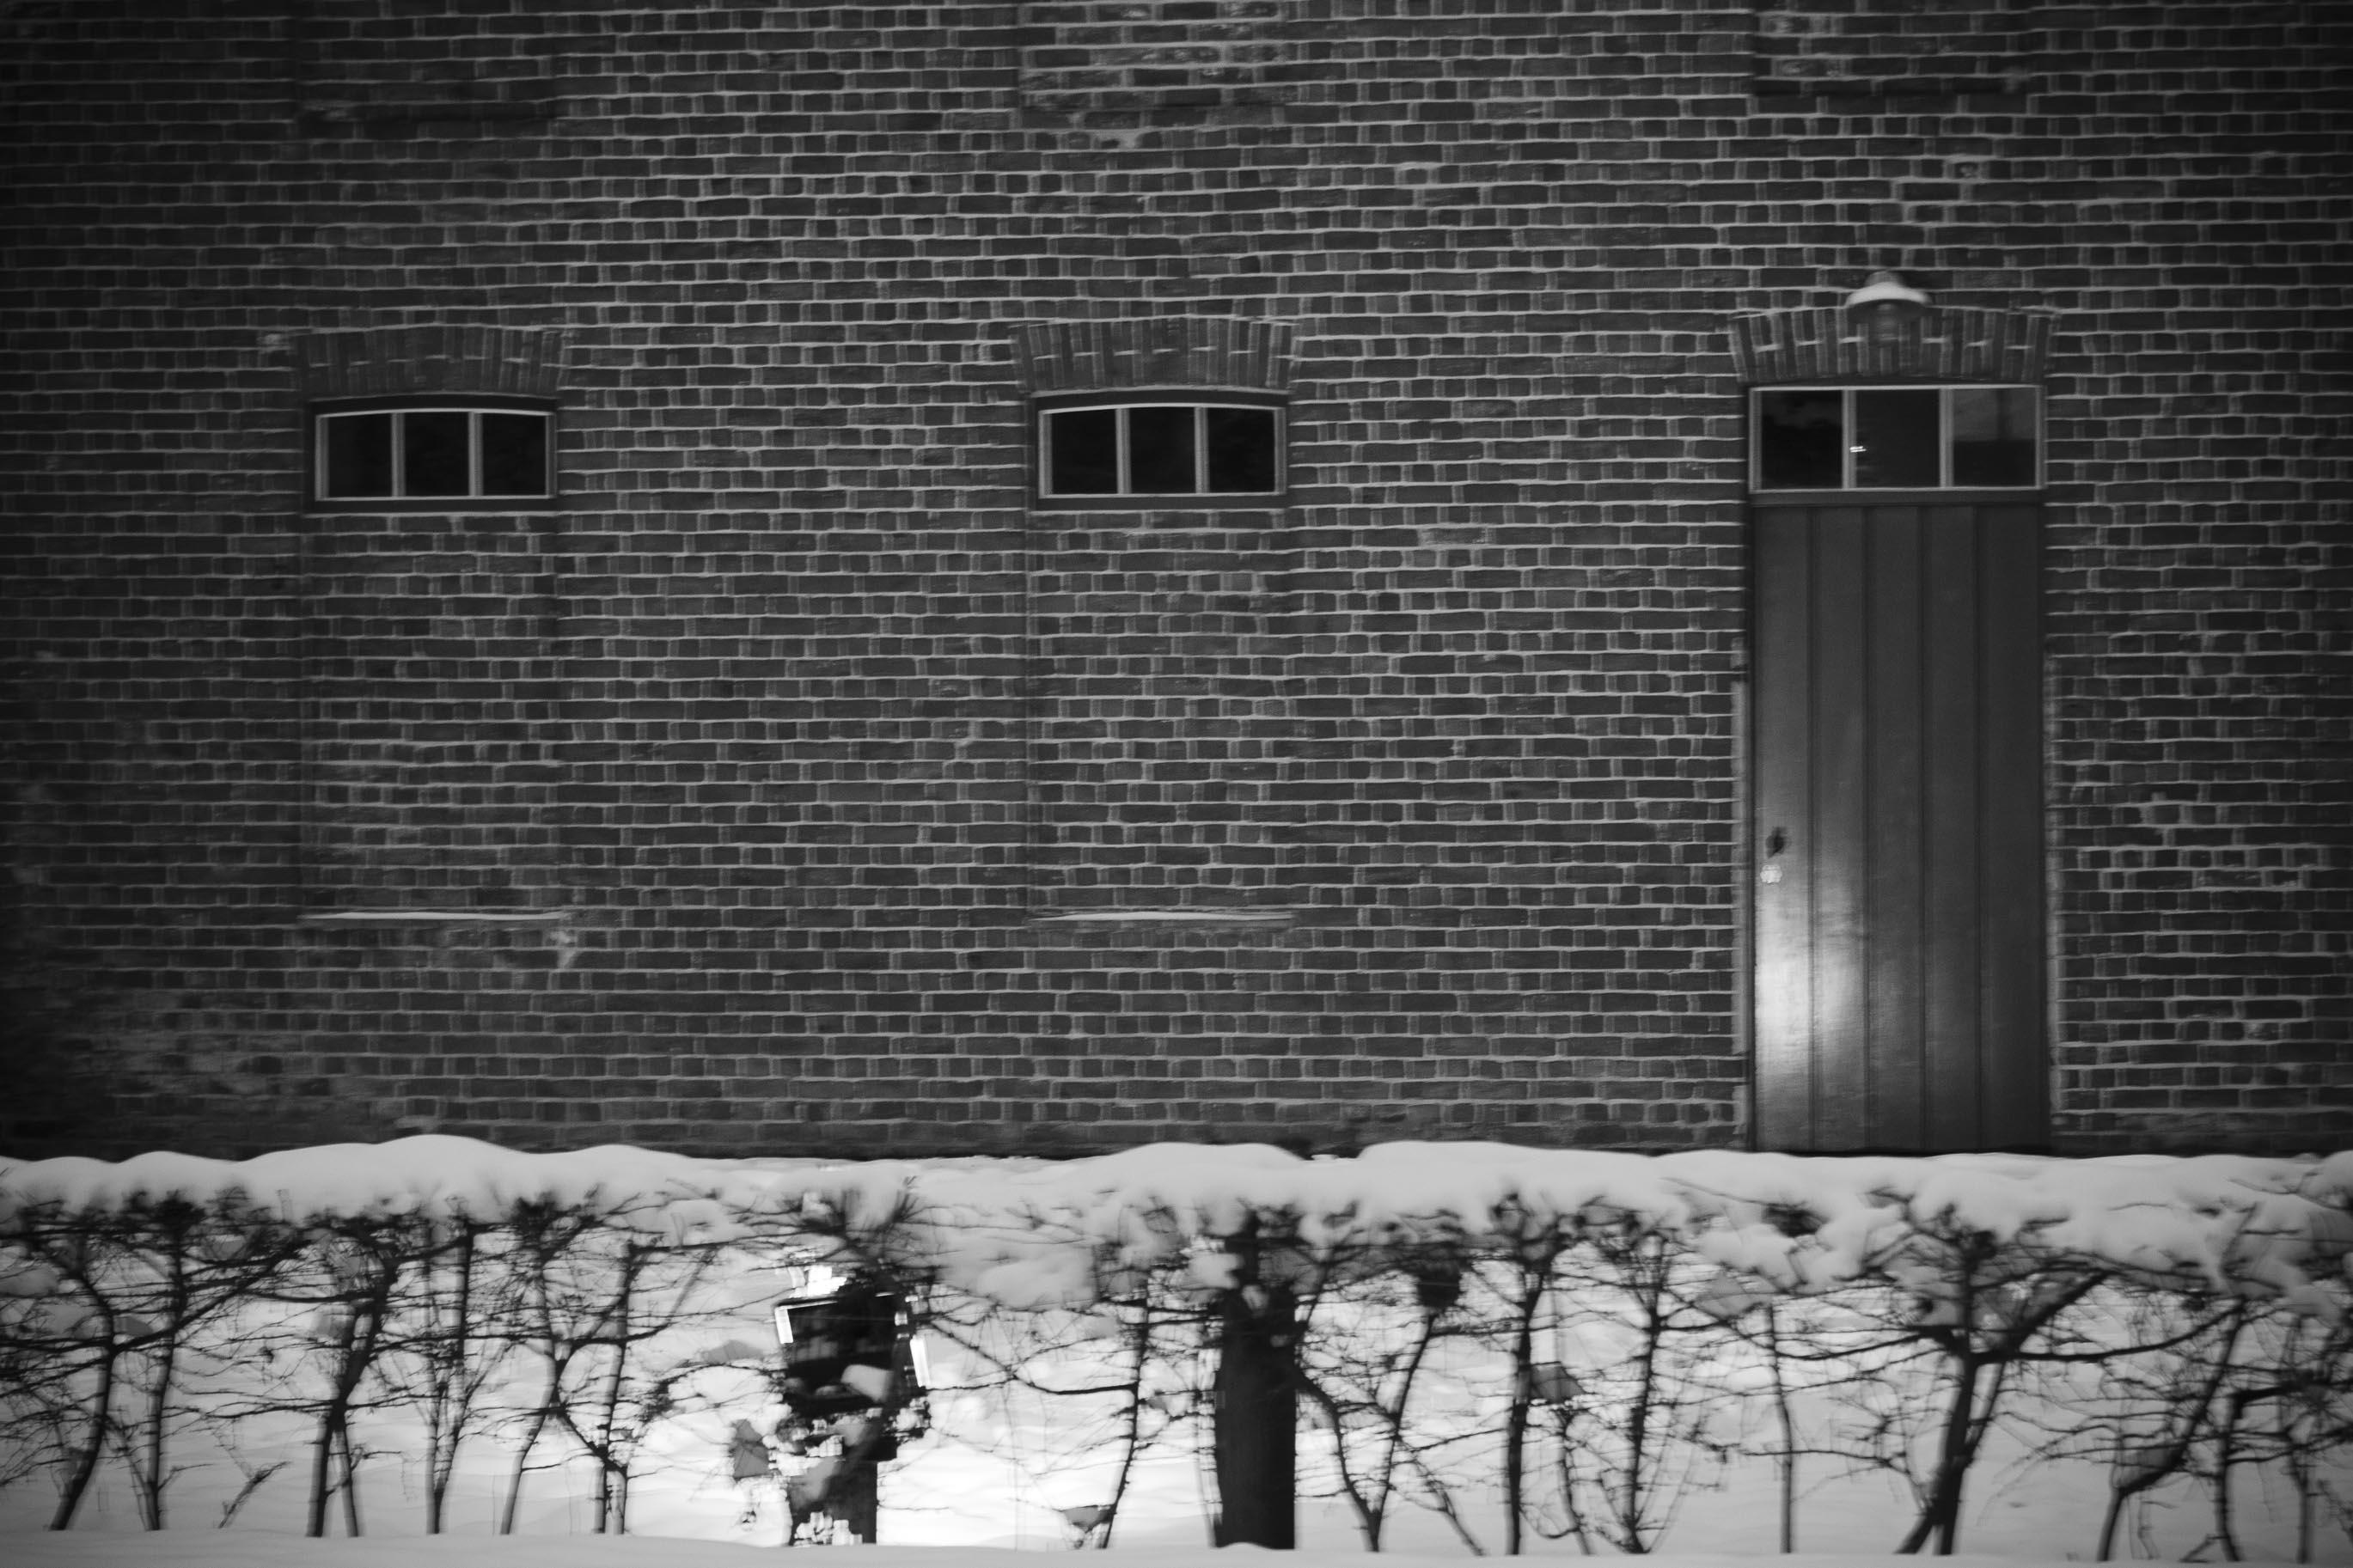 Sterrebos 19-01-2013-2-3